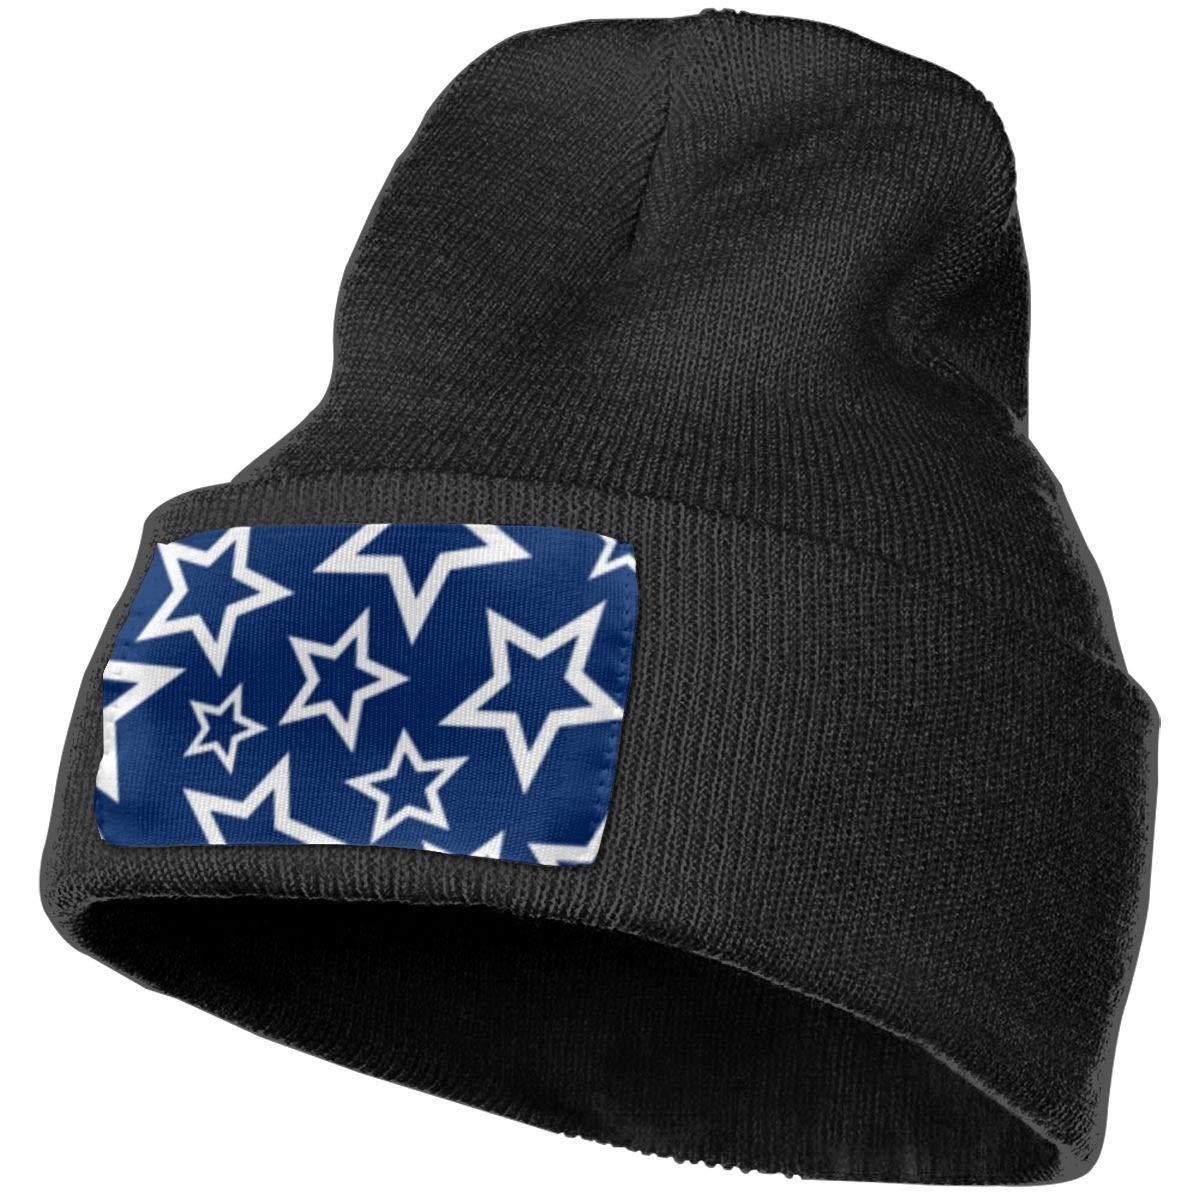 Horizon-t American Star Flag Unisex 100/% Acrylic Knitting Hat Cap Fashion Beanie Hat